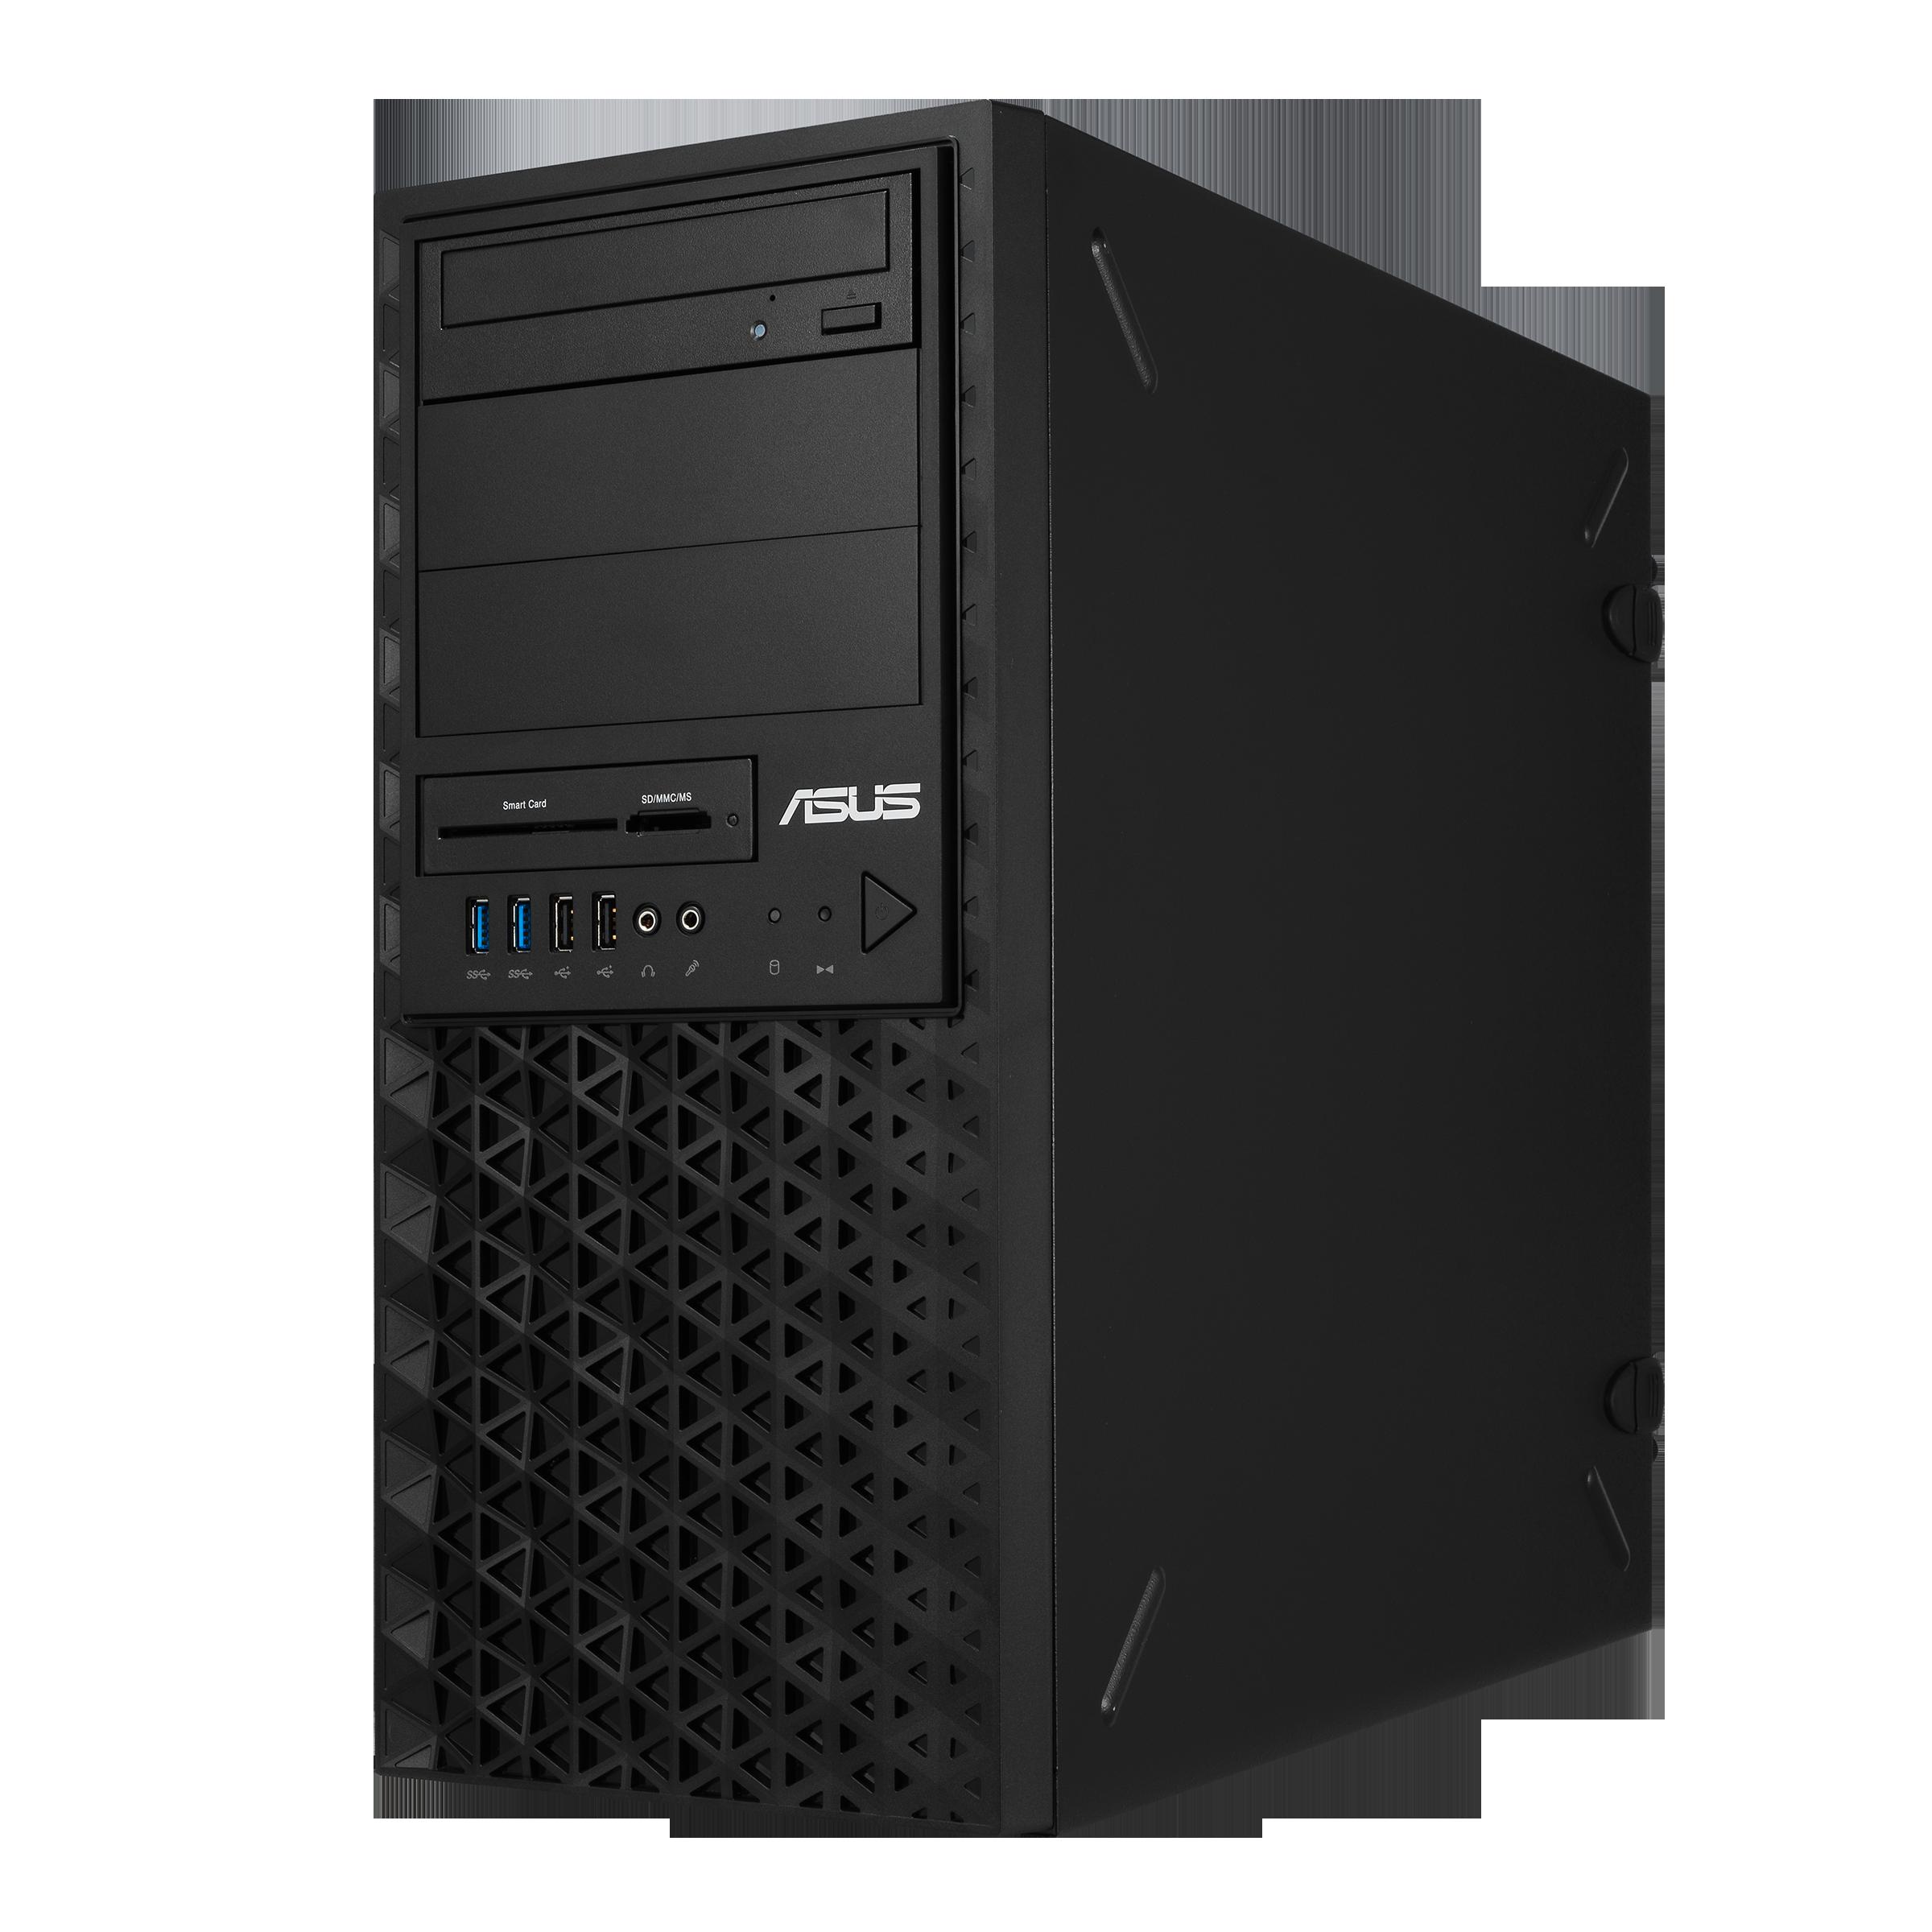 ASUS Pro E500 G6